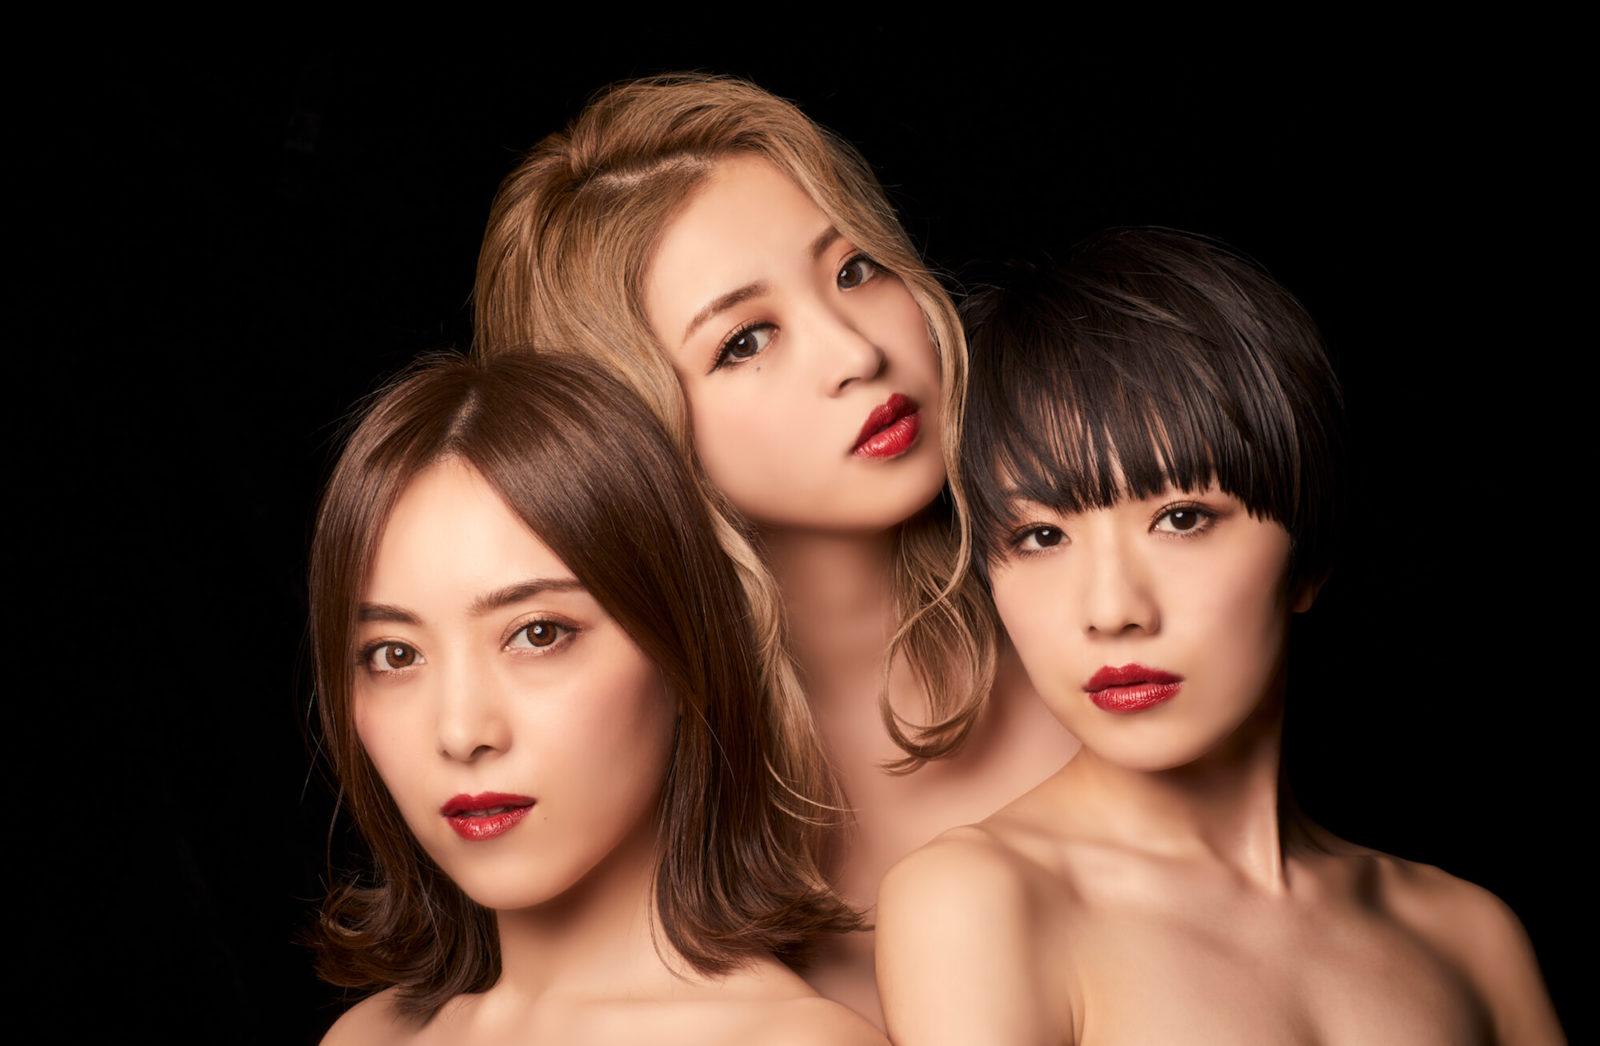 YU-A、ソロデビュー10周年記念アルバム発売決定!Foxxi misQ奇跡の再結成、新曲も収録サムネイル画像